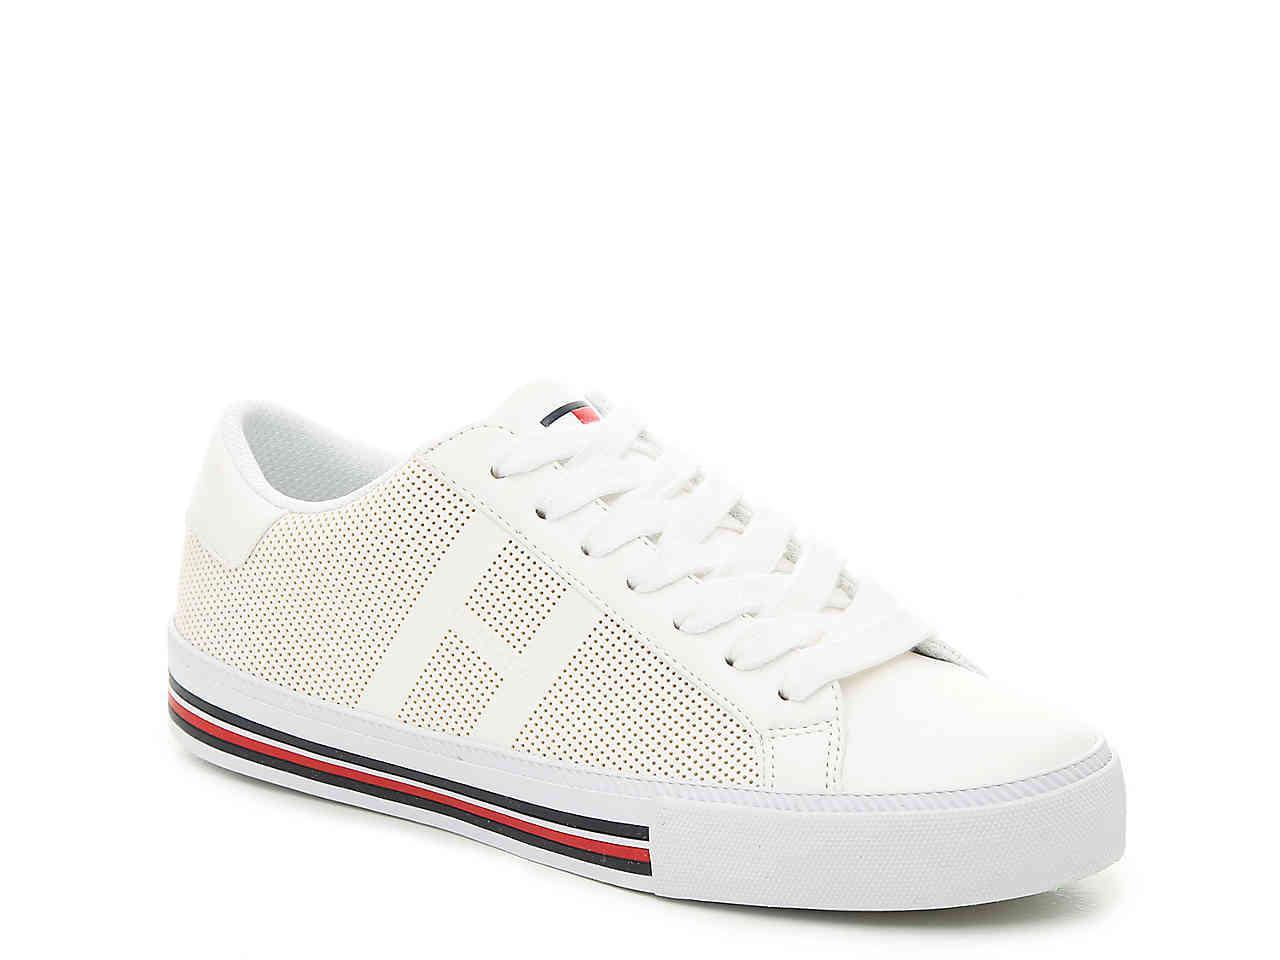 743c6e2b5aece6 Lyst - Tommy Hilfiger Tai Sneaker in White